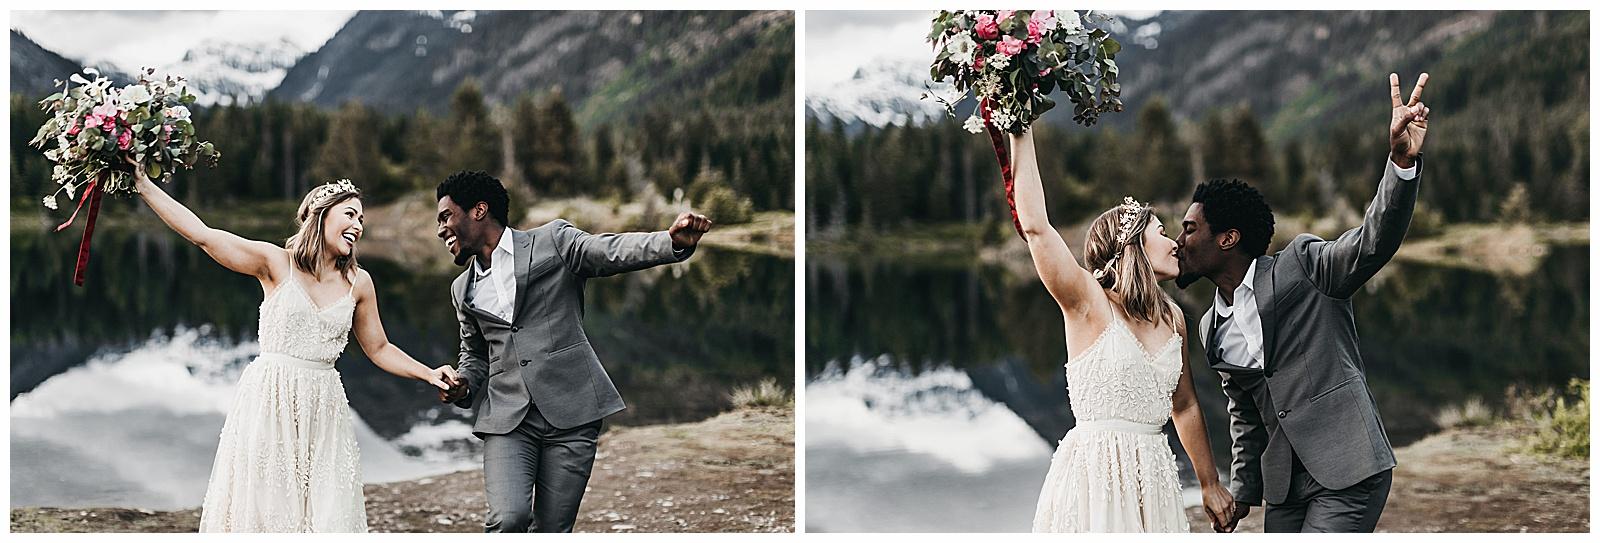 seattle-wedding-photographer-seattle-elopement-photographer-anniezav_0055.jpg